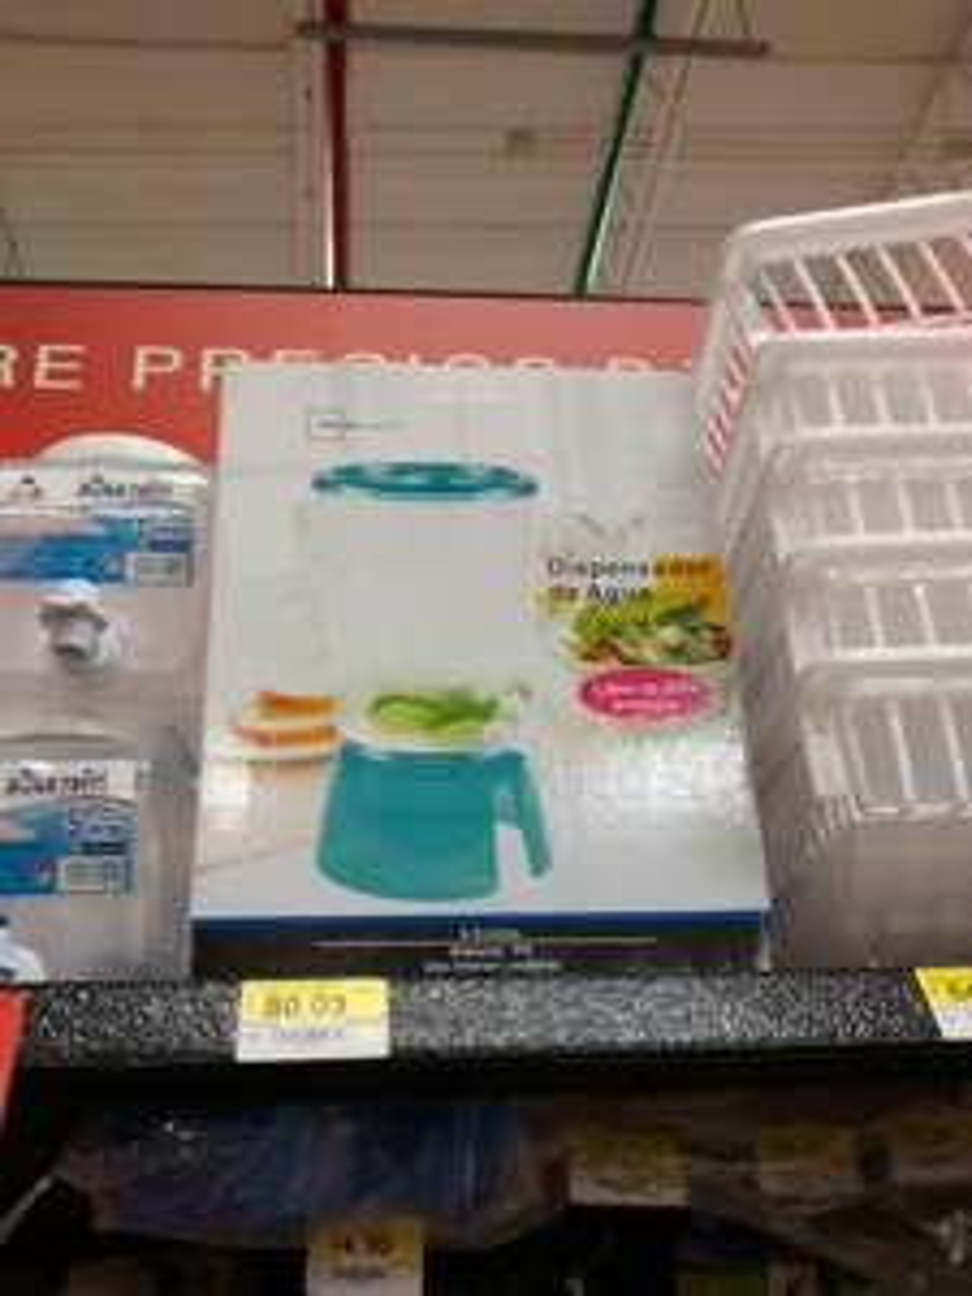 Walmart: dispensador de agua 8.9 litros a $80.03